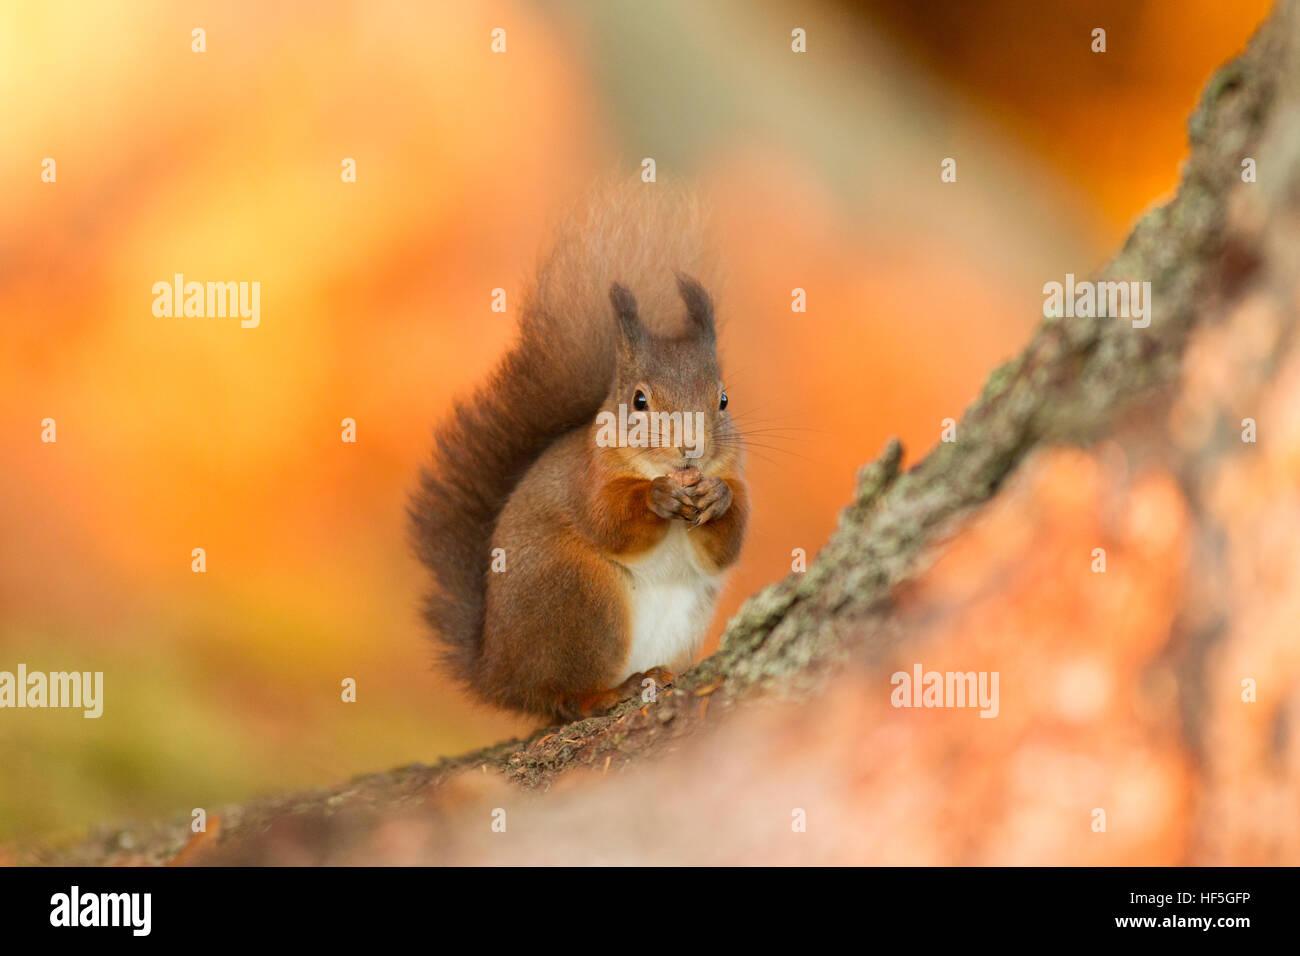 Eurasian Red squirrel (Sciurus vulgaris) feeding in autumnal setting. Highland.Scotland.Great Britain. - Stock Image